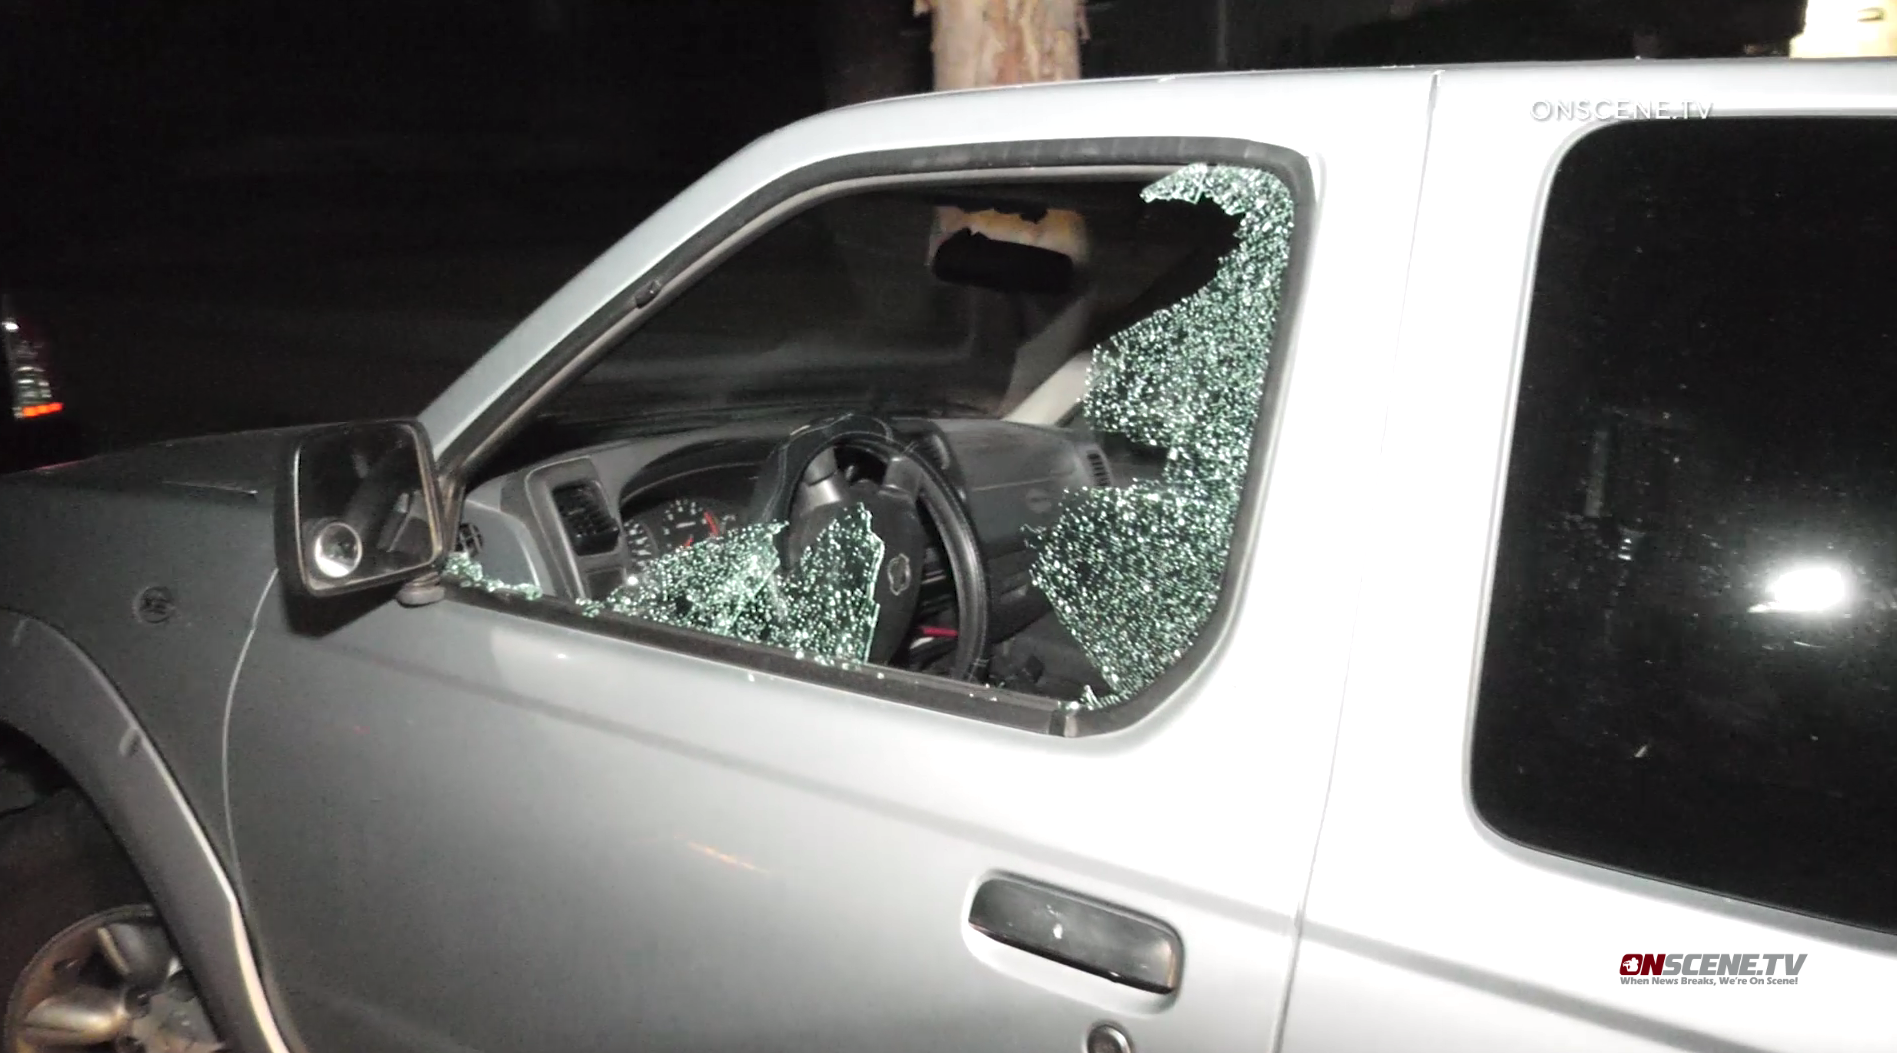 Dozens of vehicles were damaged in an overnight vandalism spree with a BB gun in Whittier and La Habra on Jan. 23, 2020. (KTLA)